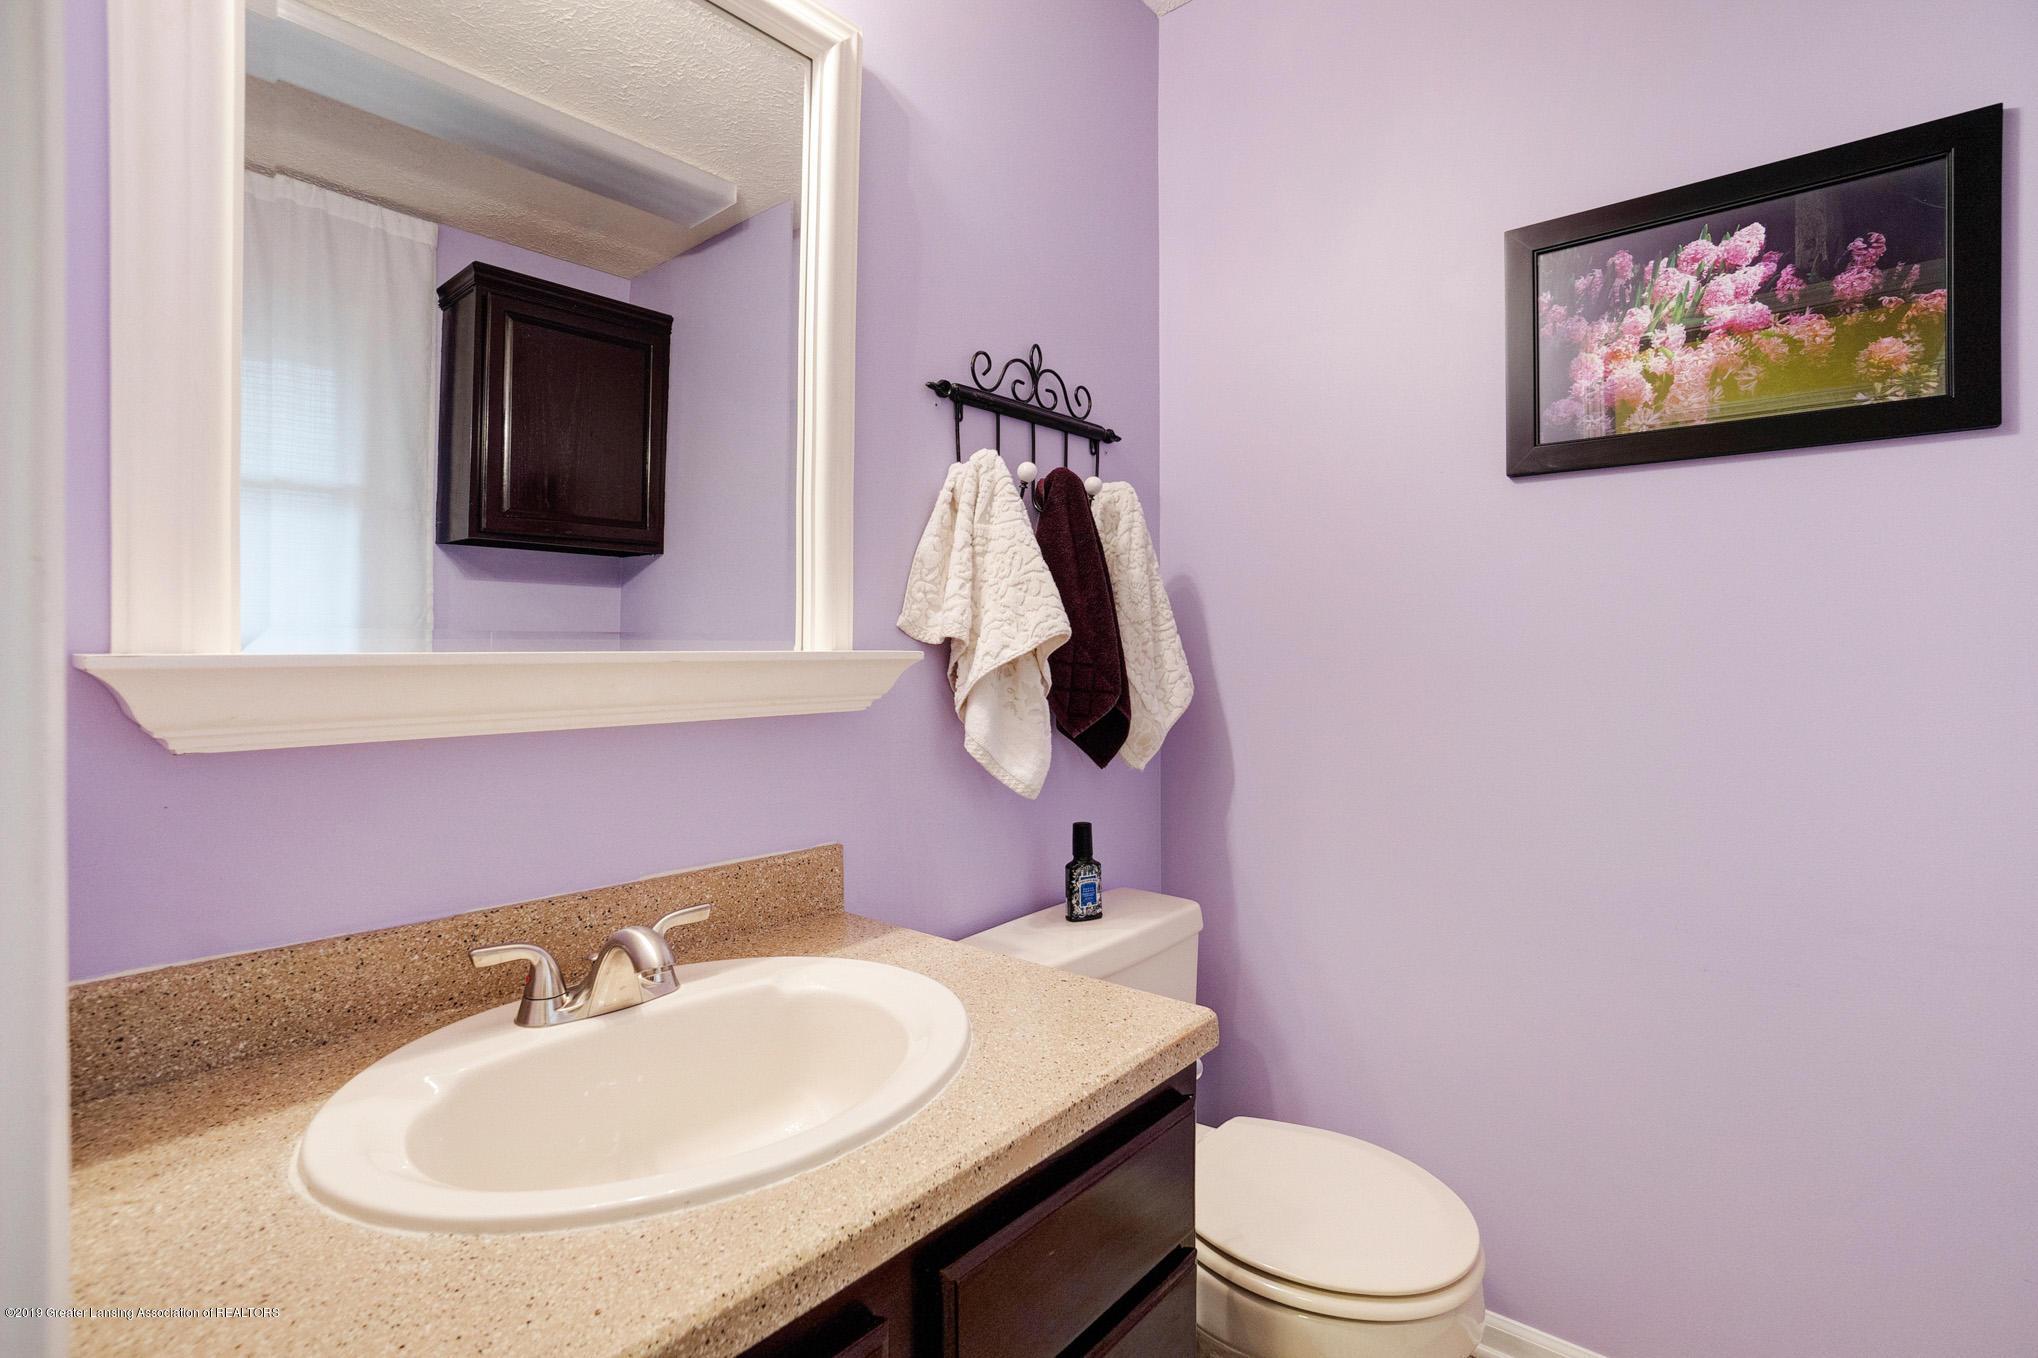 2540 Cunningham Dr - Bathroom/Laundry - 15